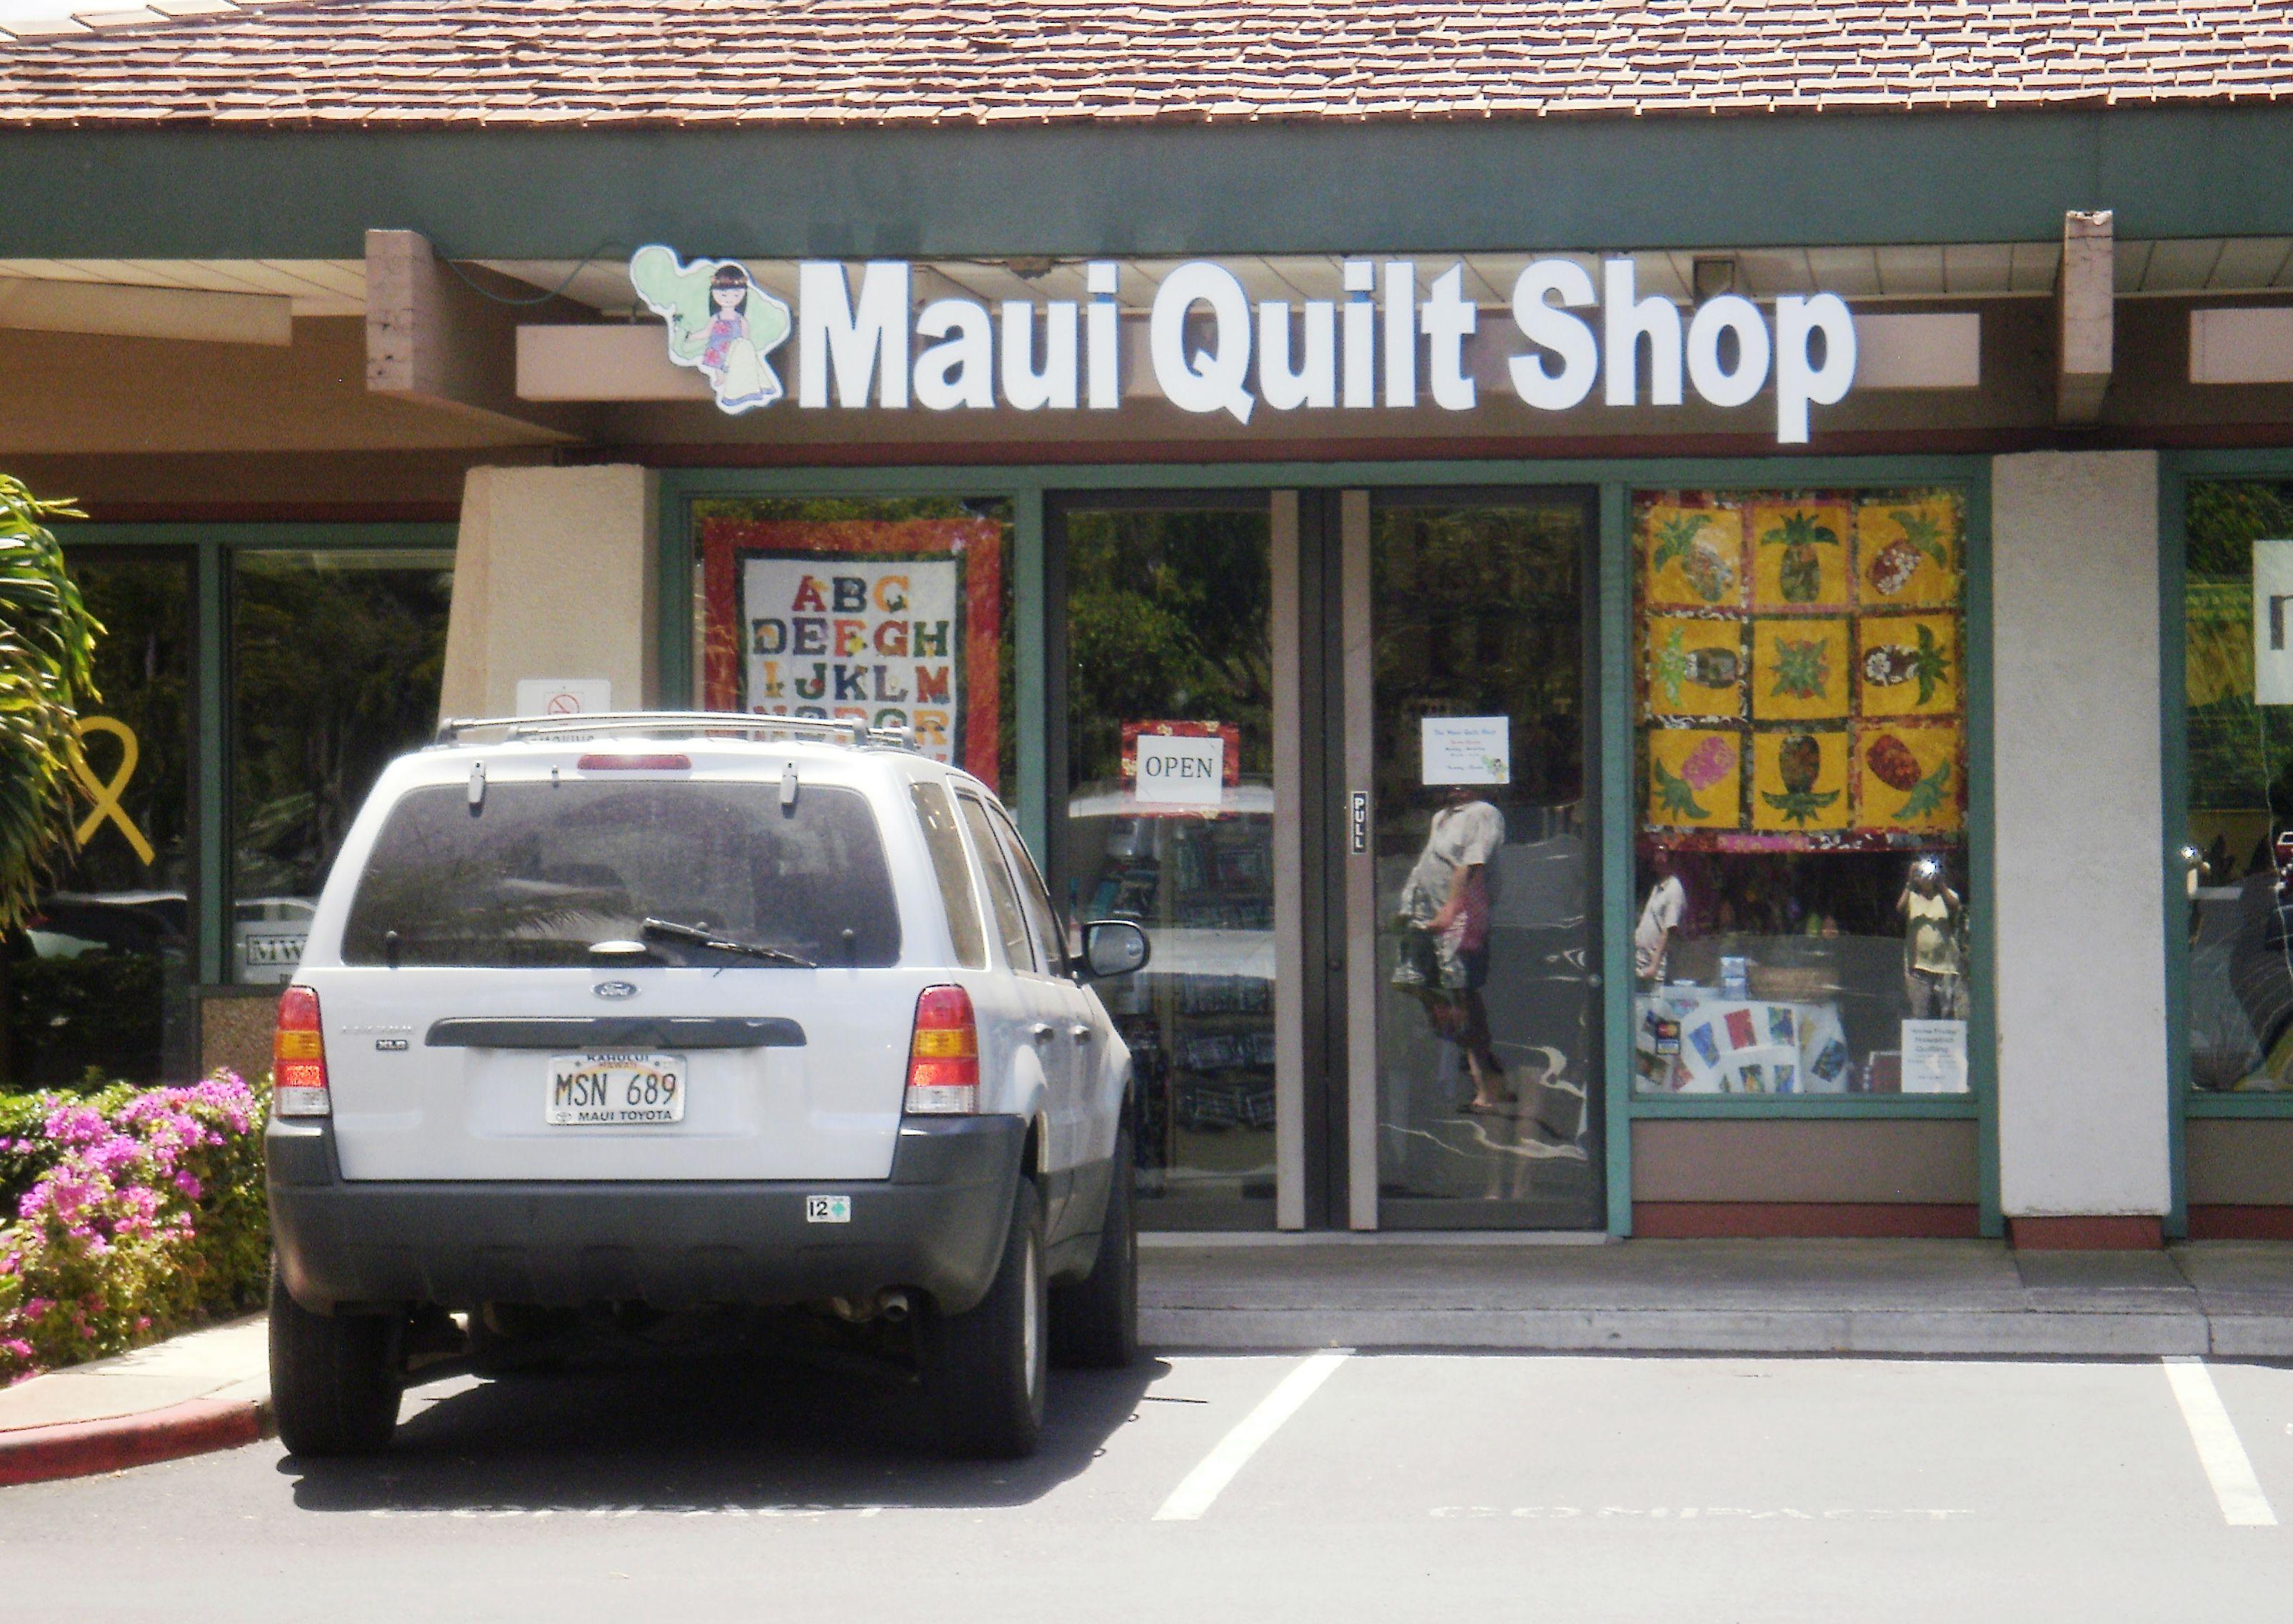 I ❤Maui Quilt Shop - Kihei. Maui. Dropped some cash here on ... : hawaii quilt shops - Adamdwight.com